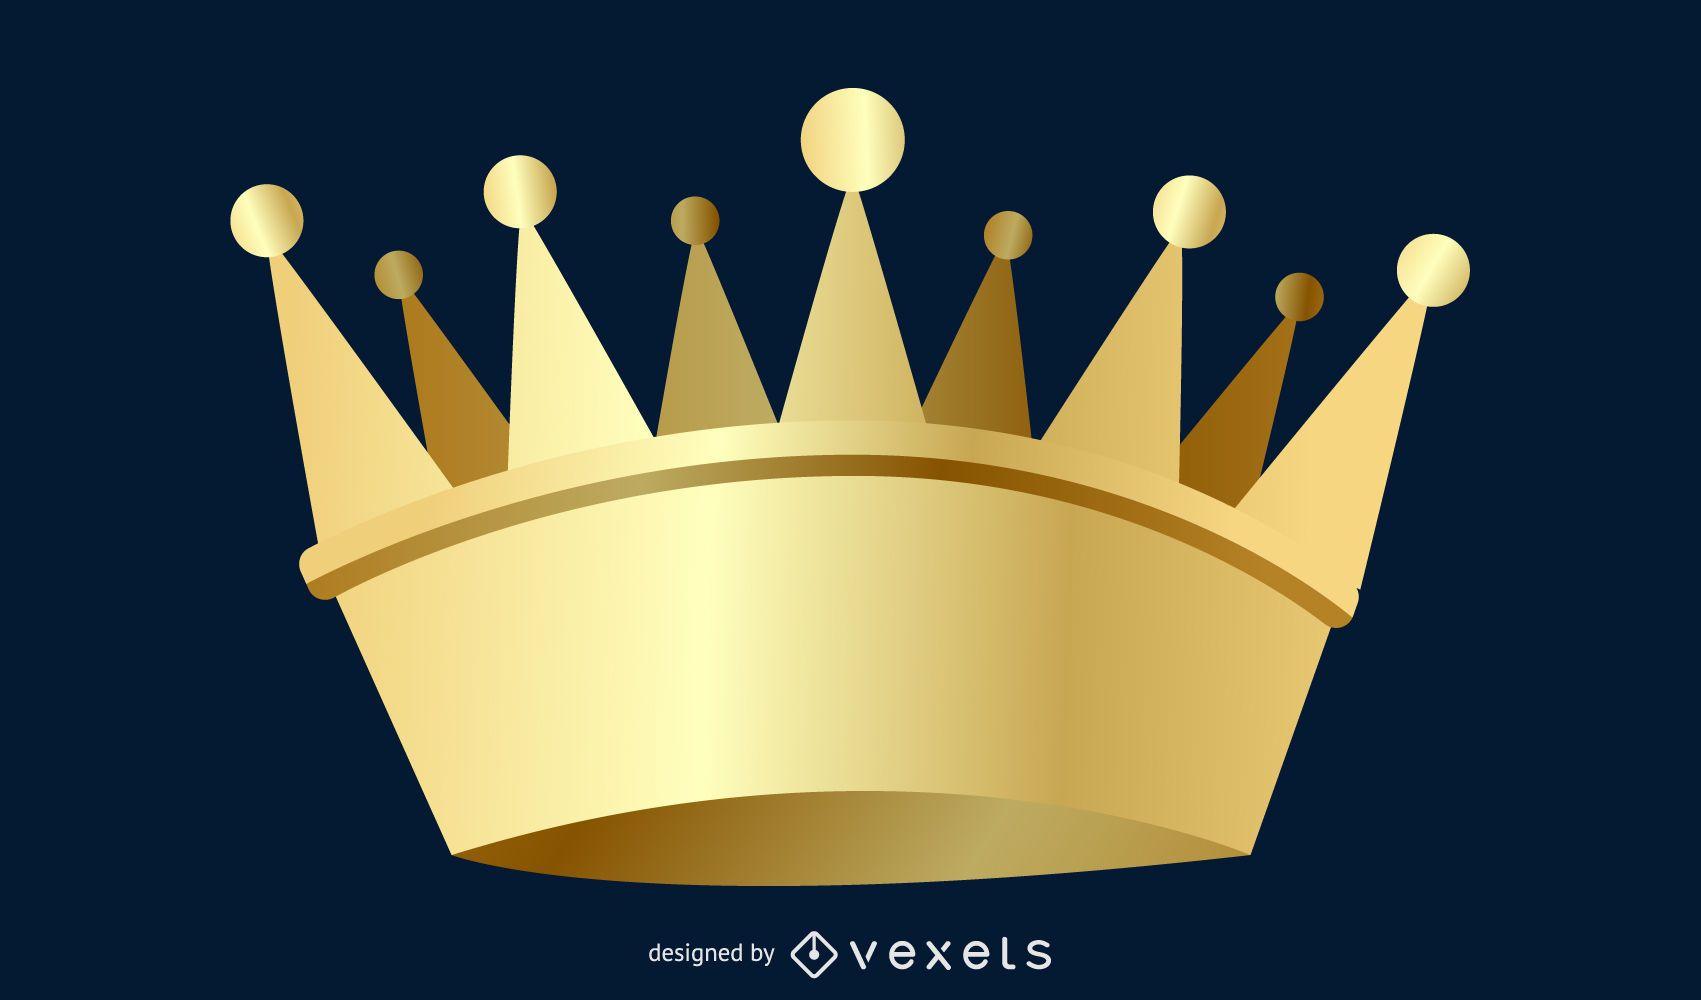 3d rey y reina corona vector corona Ai vector Photoshop corona diseño Illustrator Ai